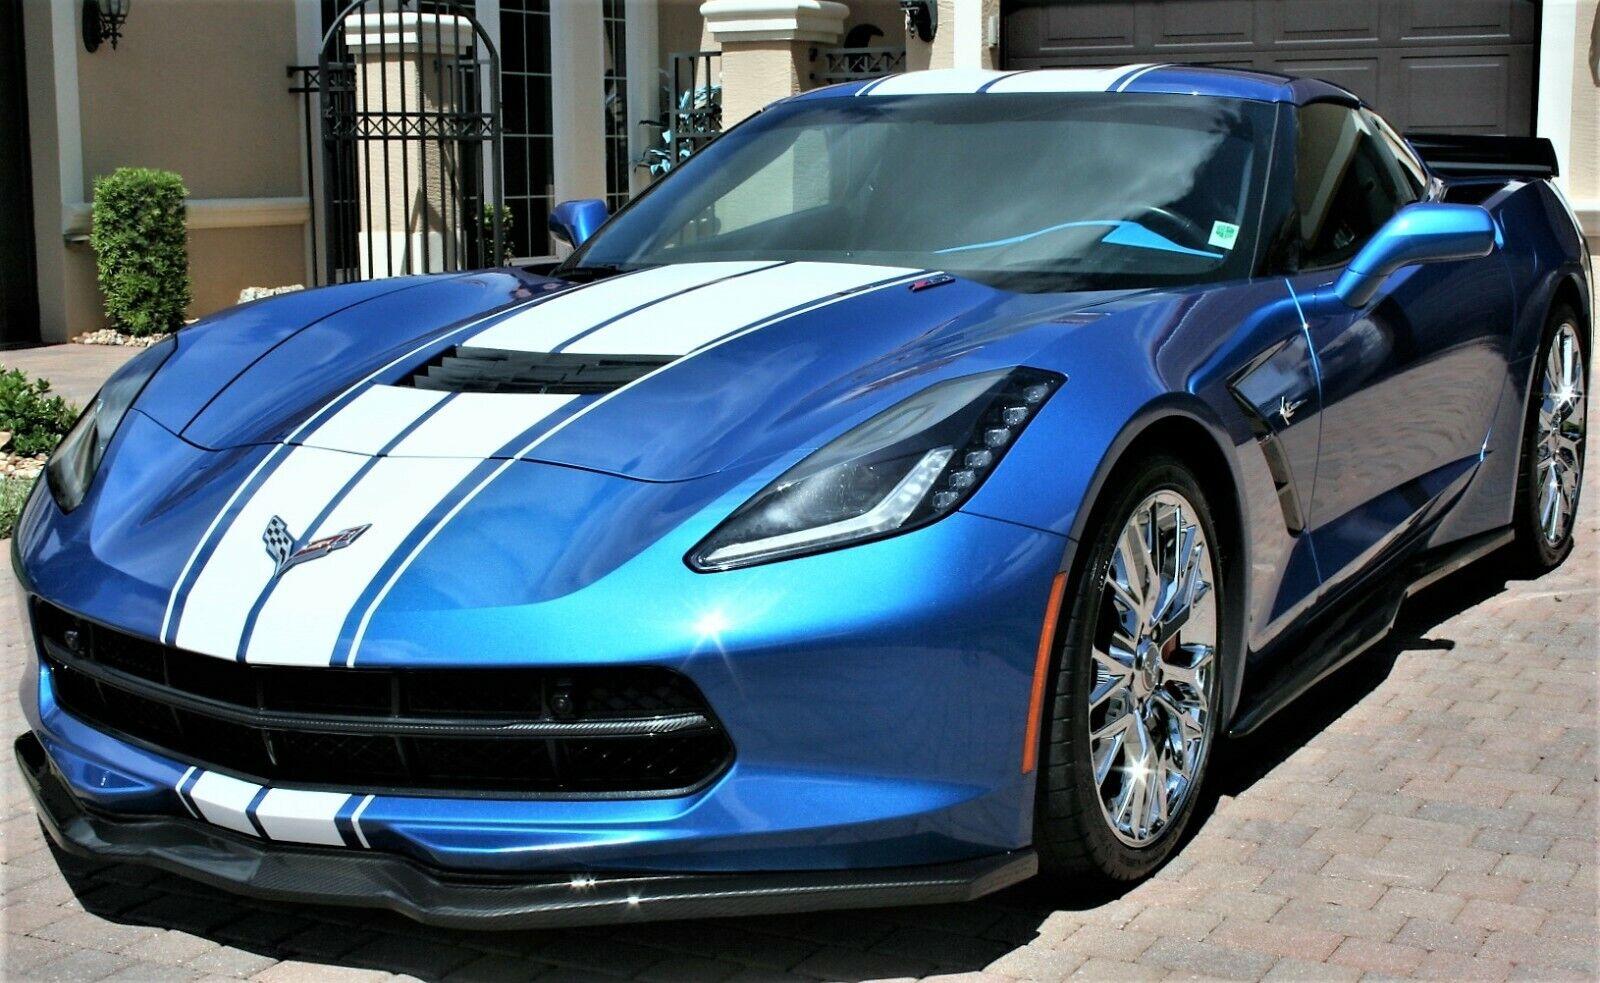 2016 Laguna Blue Chevrolet Corvette  3LT   C7 Corvette Photo 1